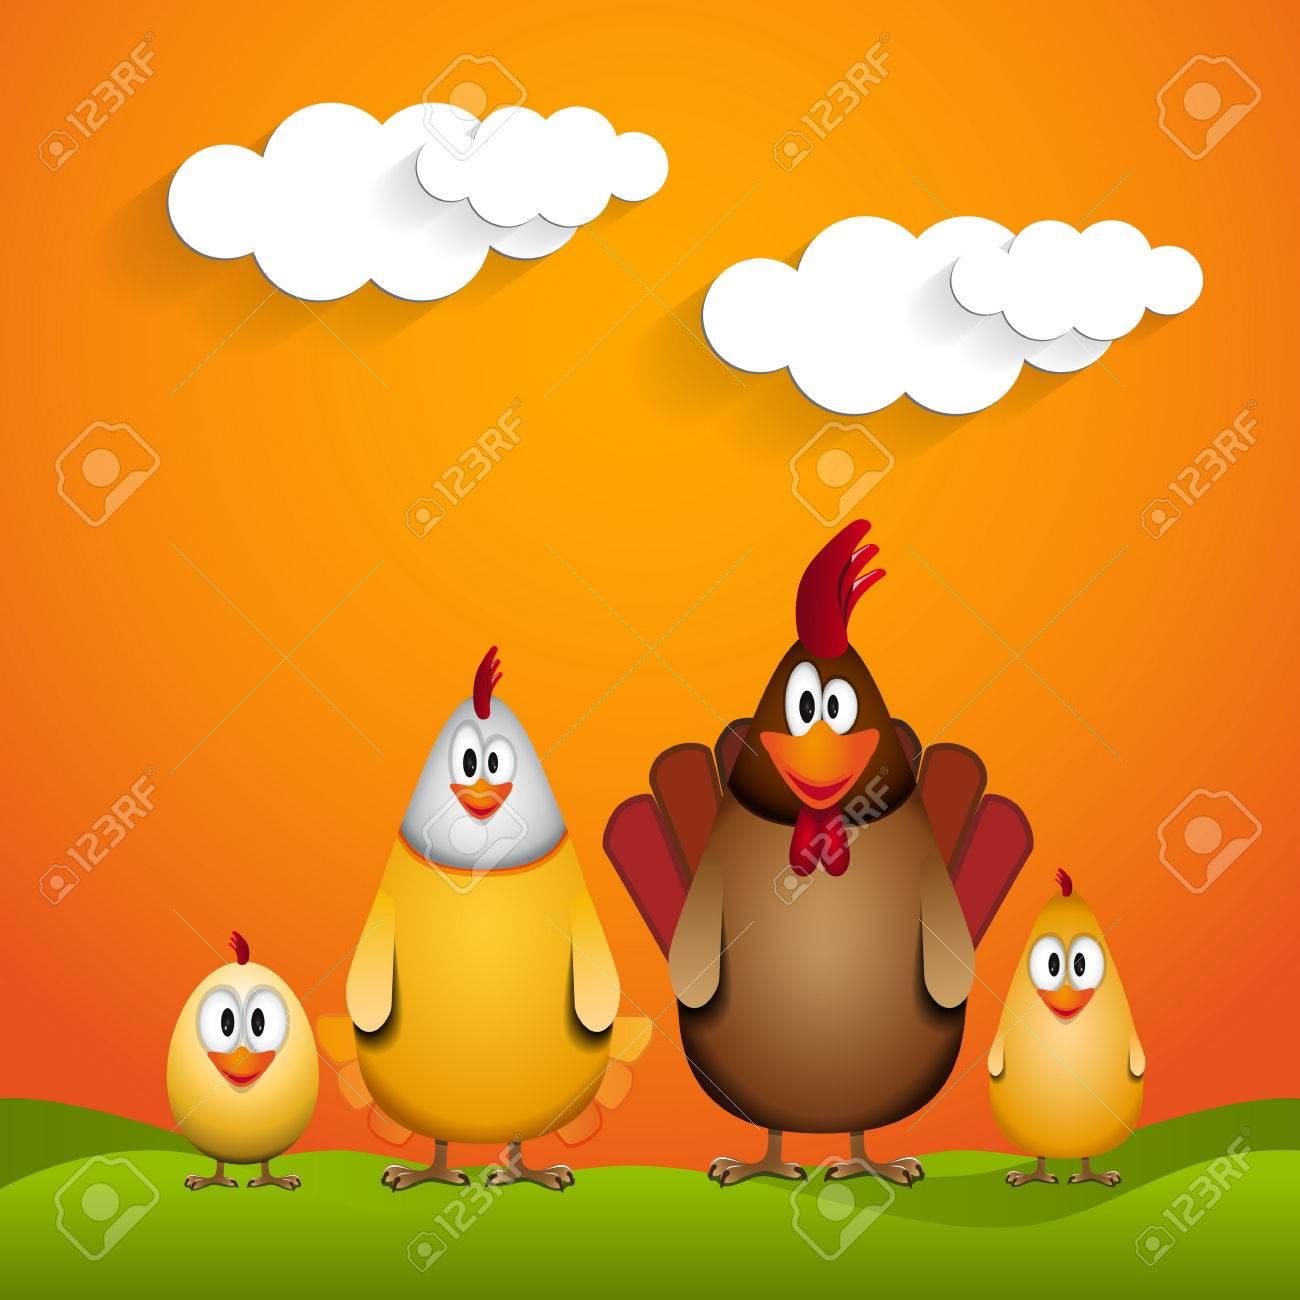 Frohe Ostern Lustige Hühnerfamilie Illustration Lizenzfrei